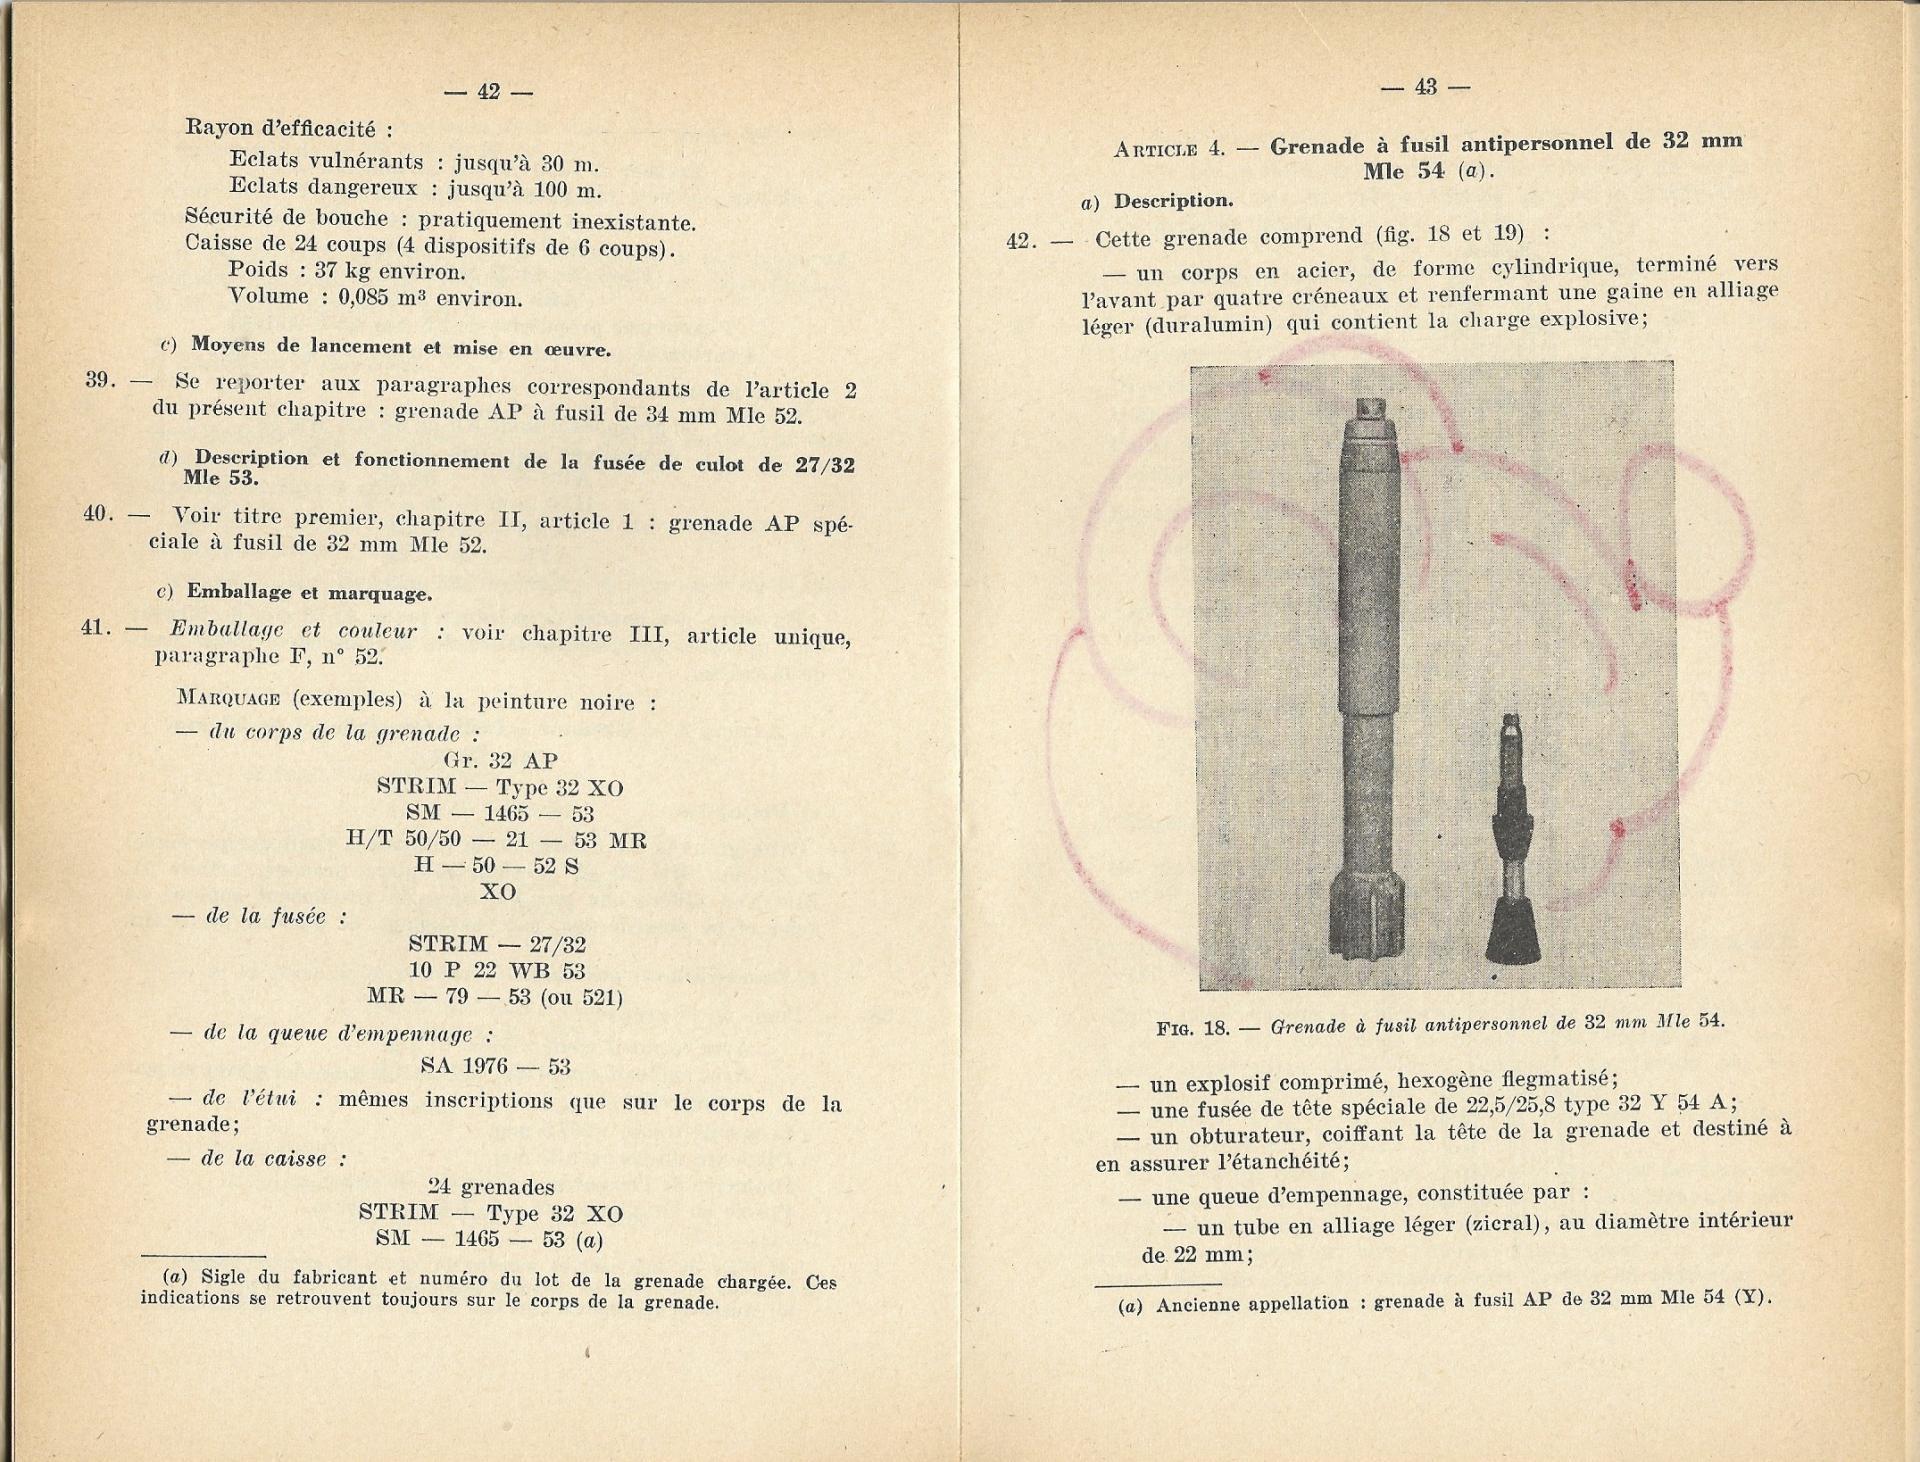 Grenades a fusil 1957 p42 43 1